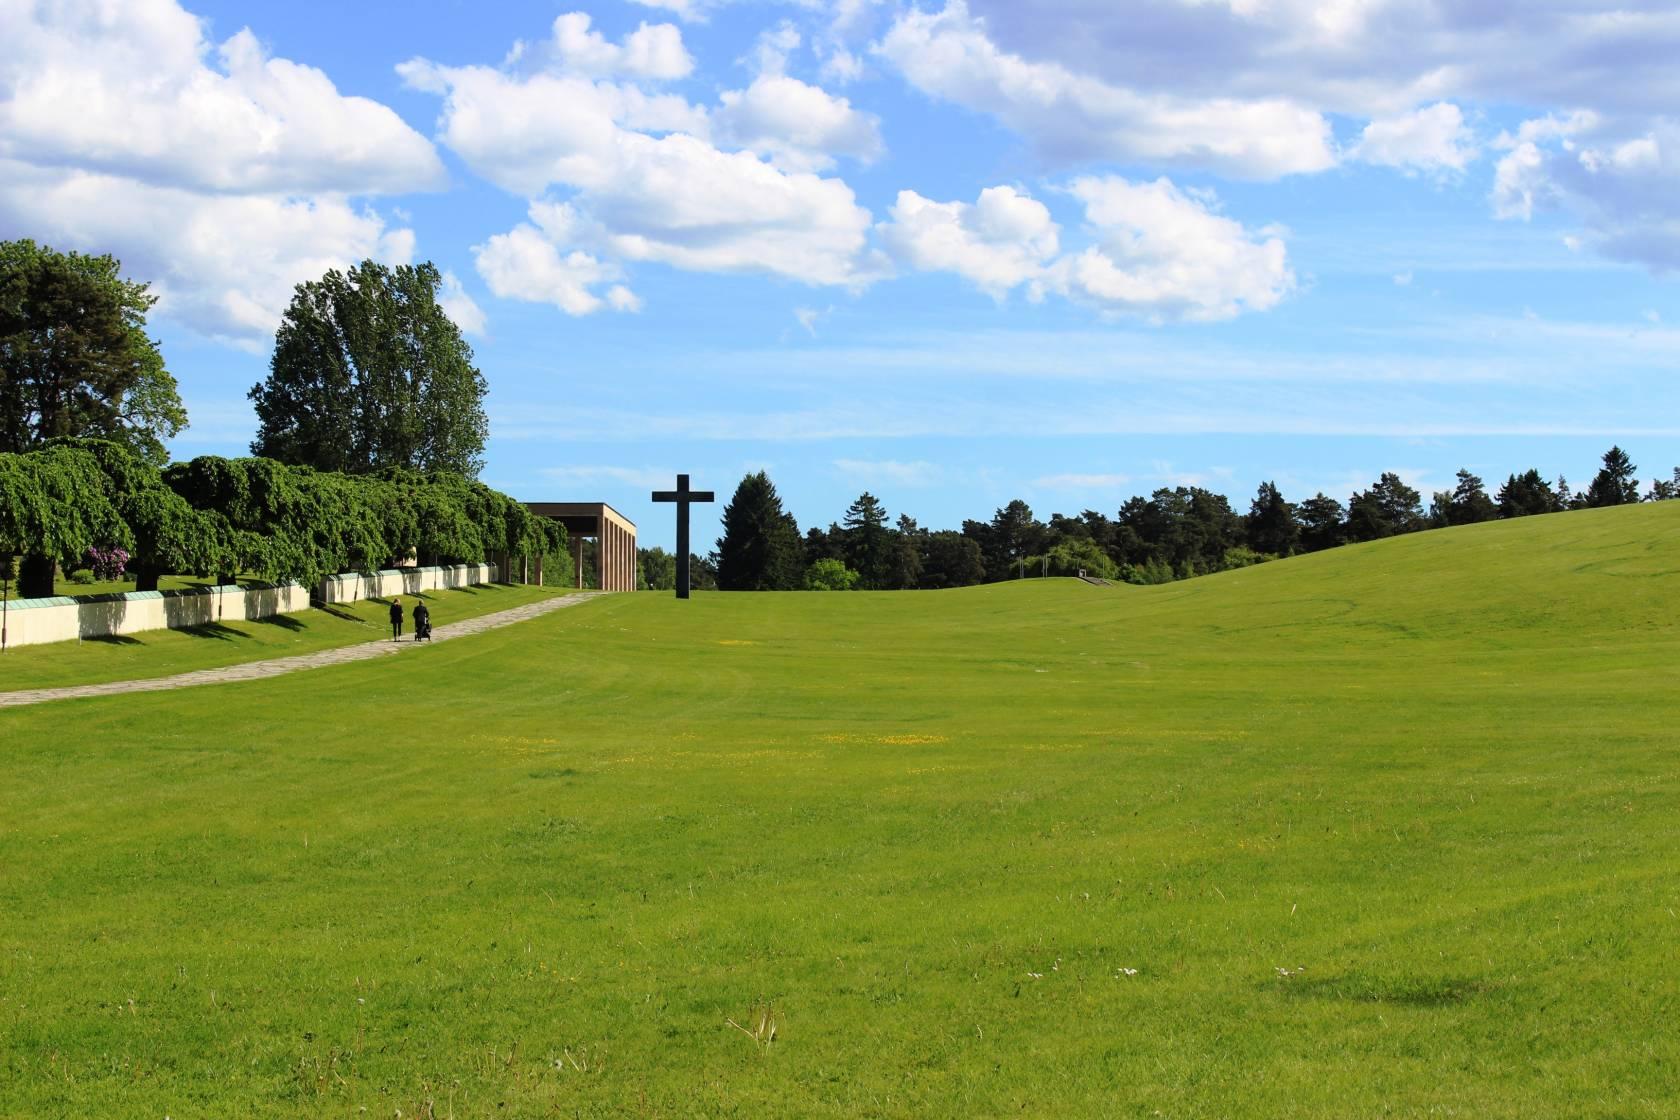 Cimiteo Skogskyrkogarden Stoccolma